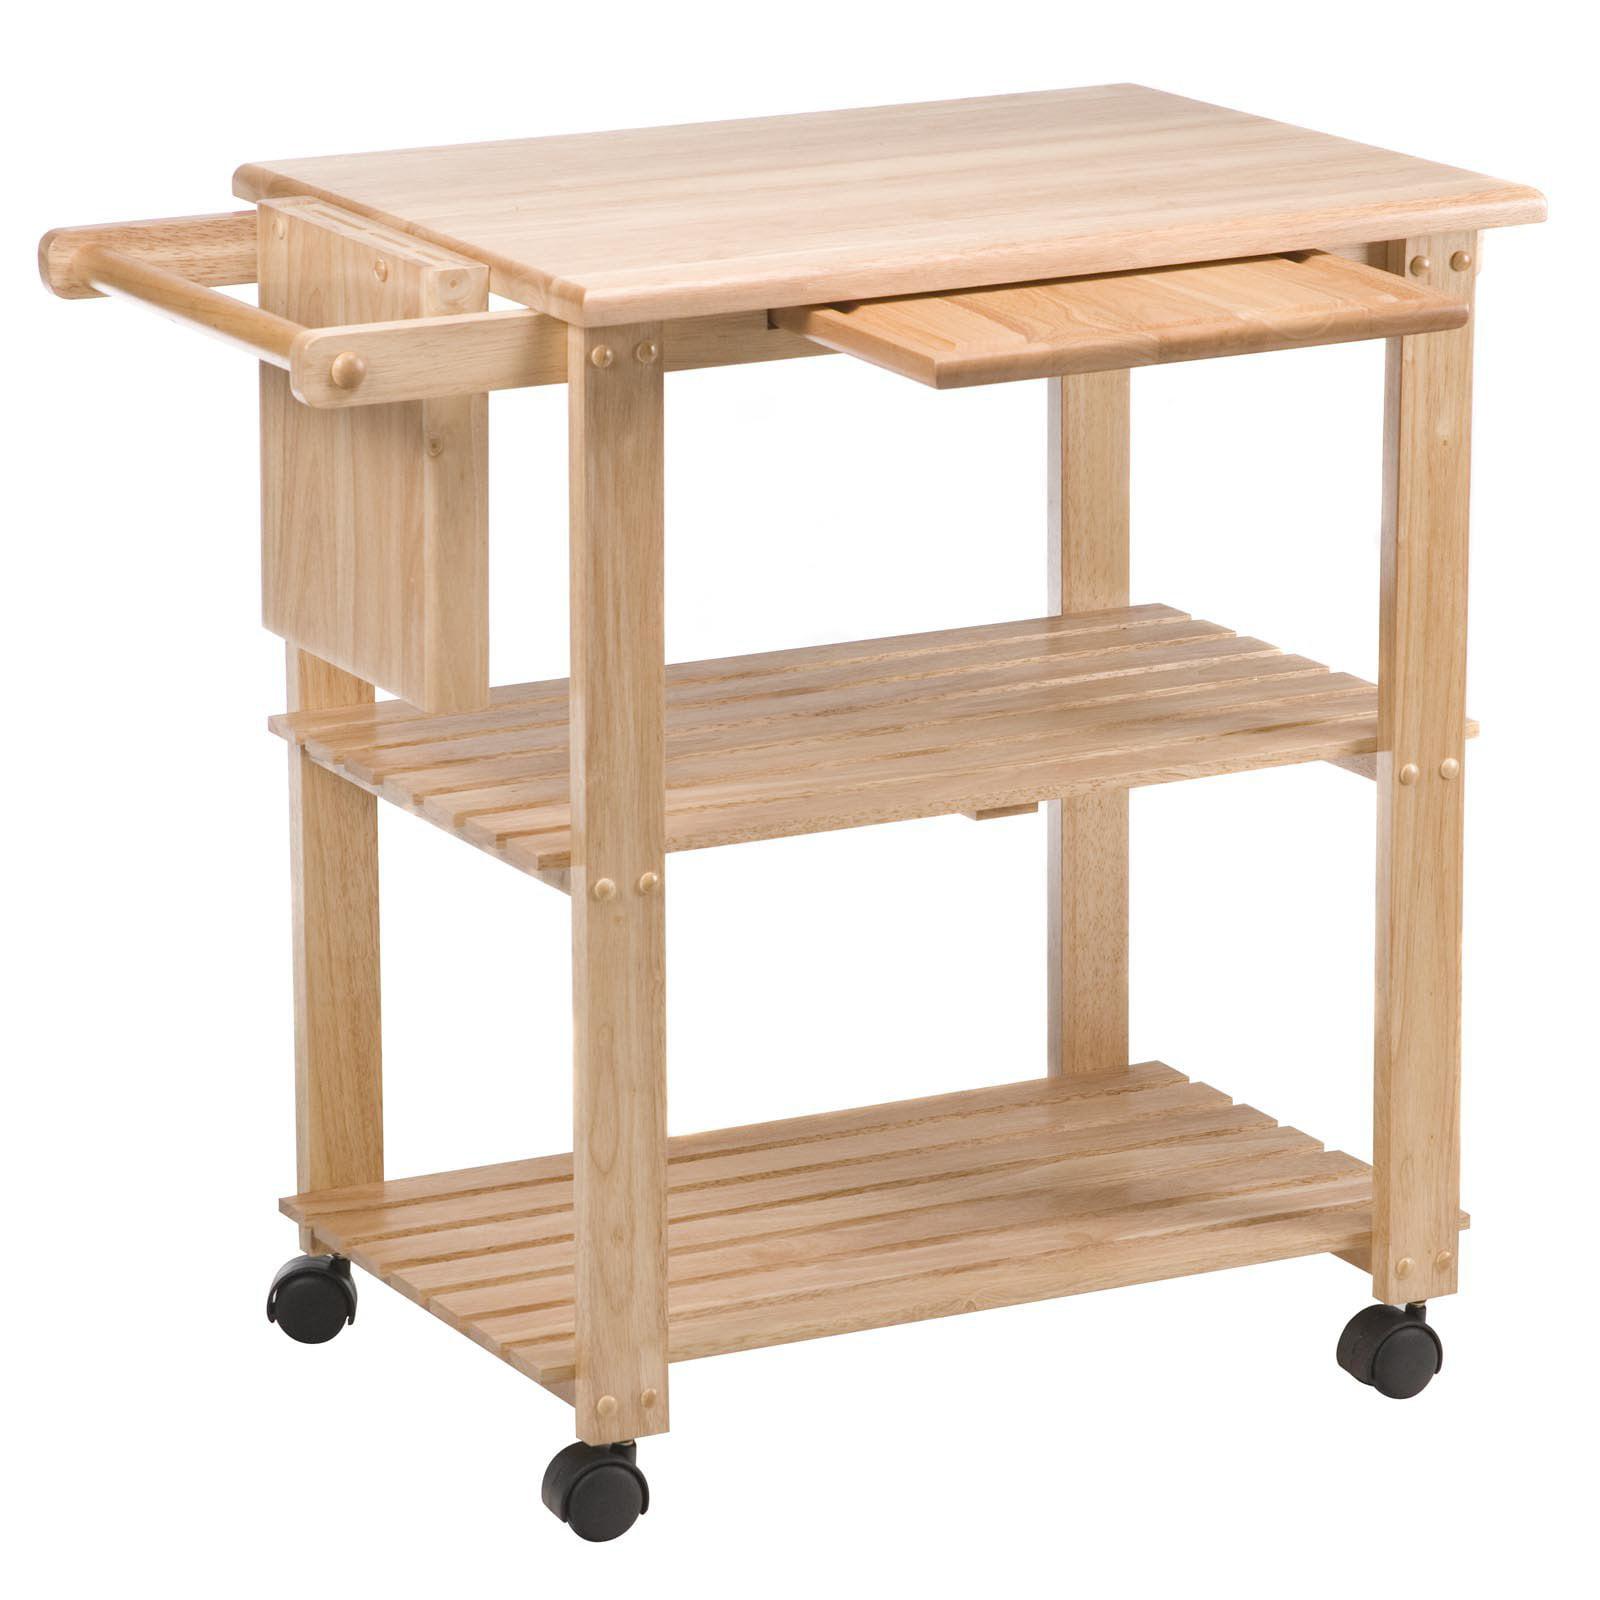 Lovely Walmart.com Idea Kitchen Utility Cart